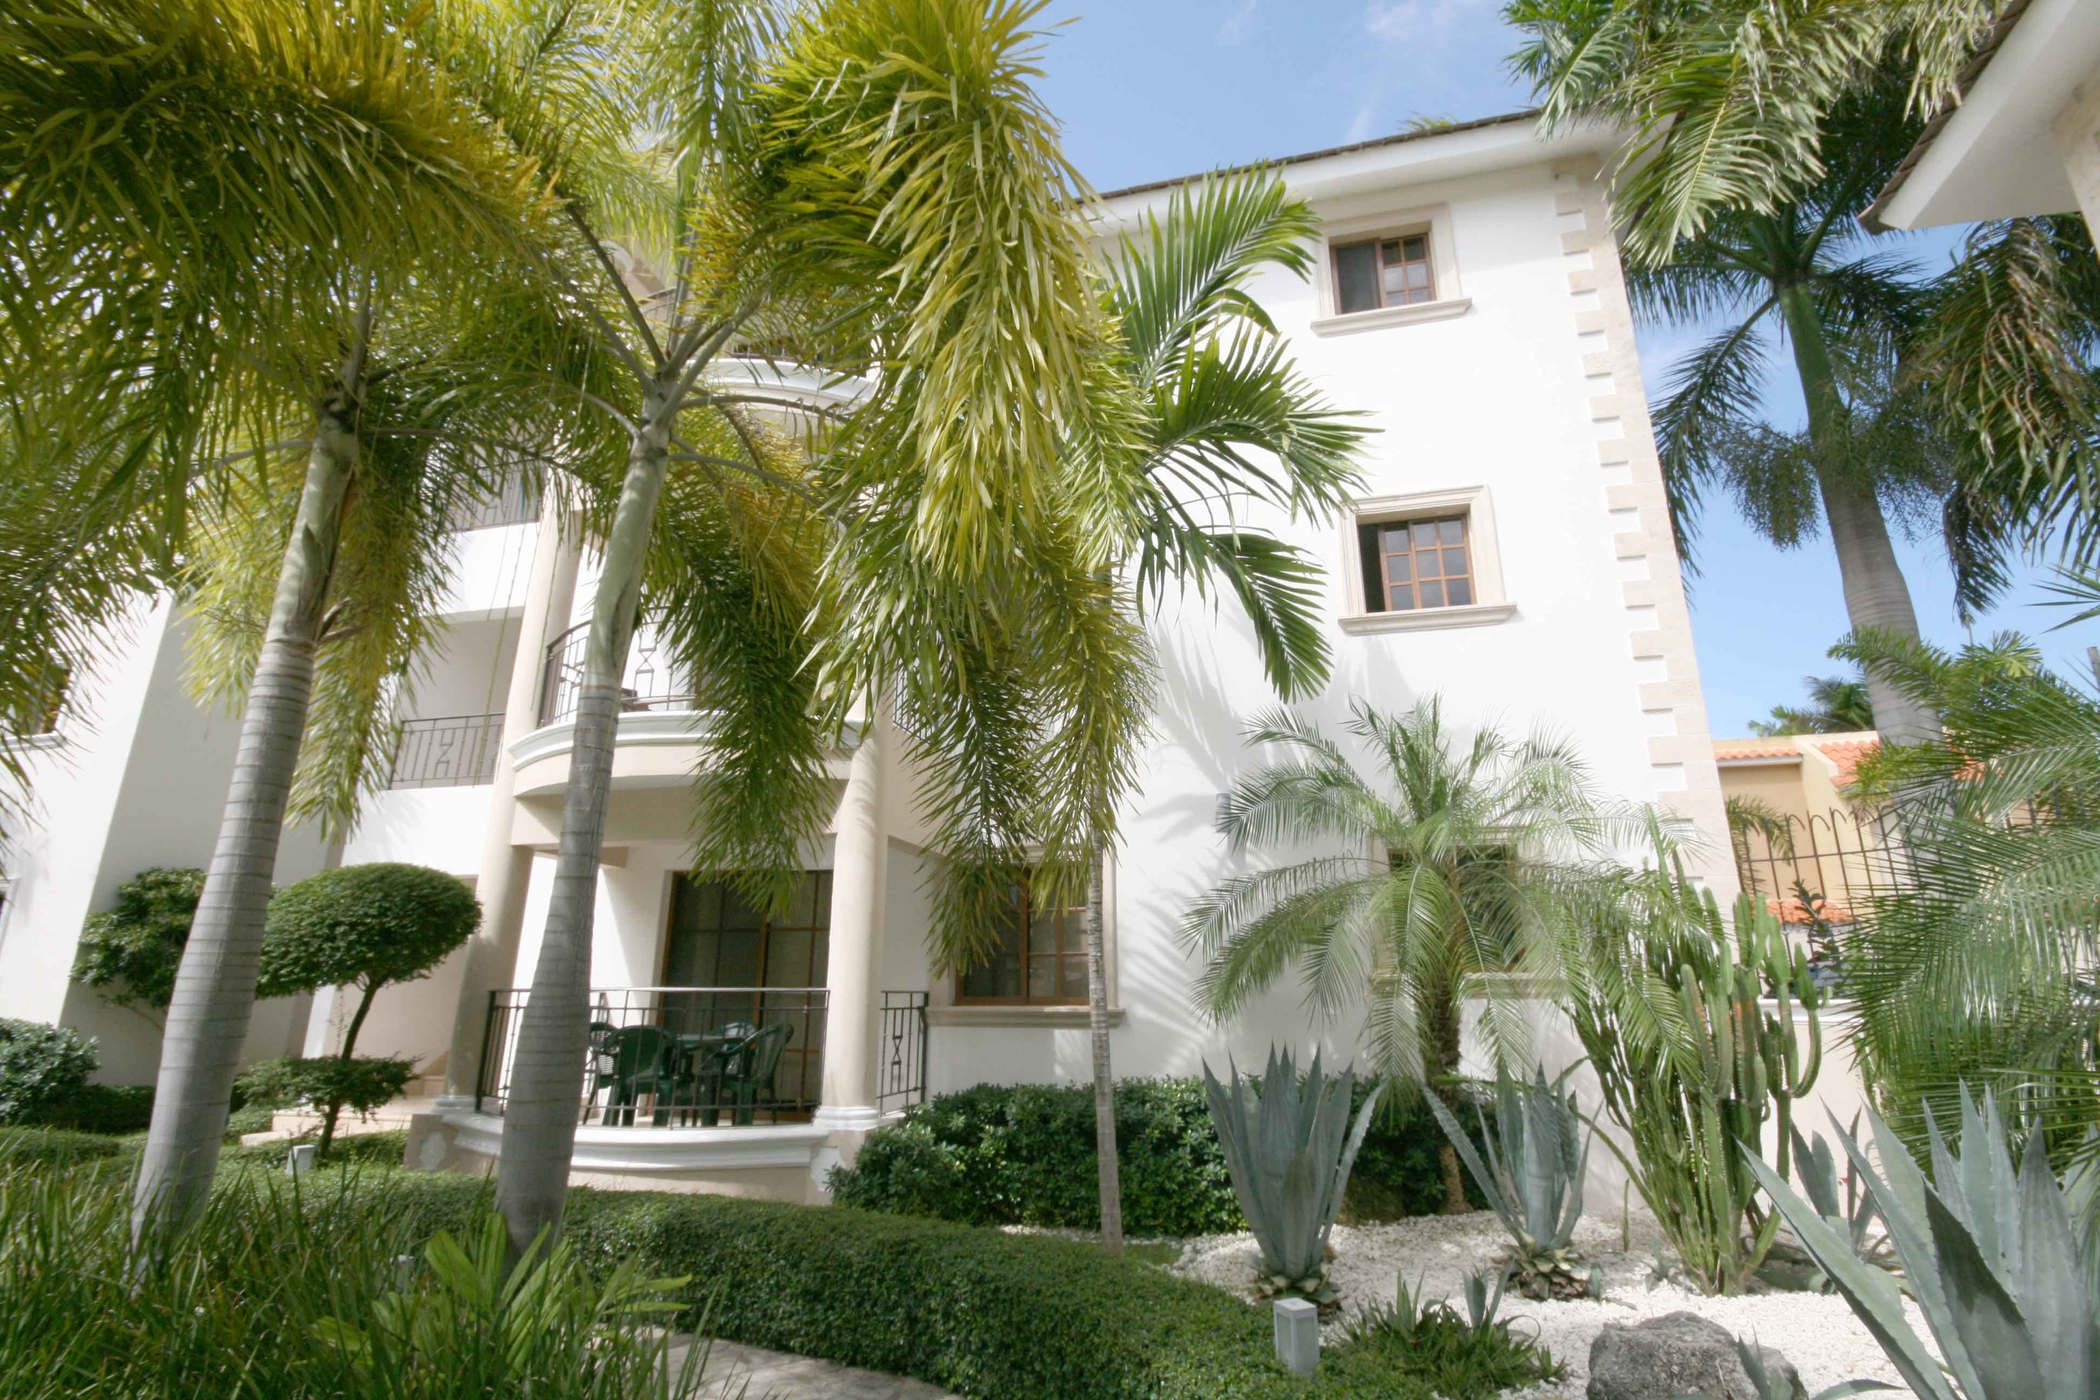 2 bedrooms condo next the beach in Rosa Hermosa